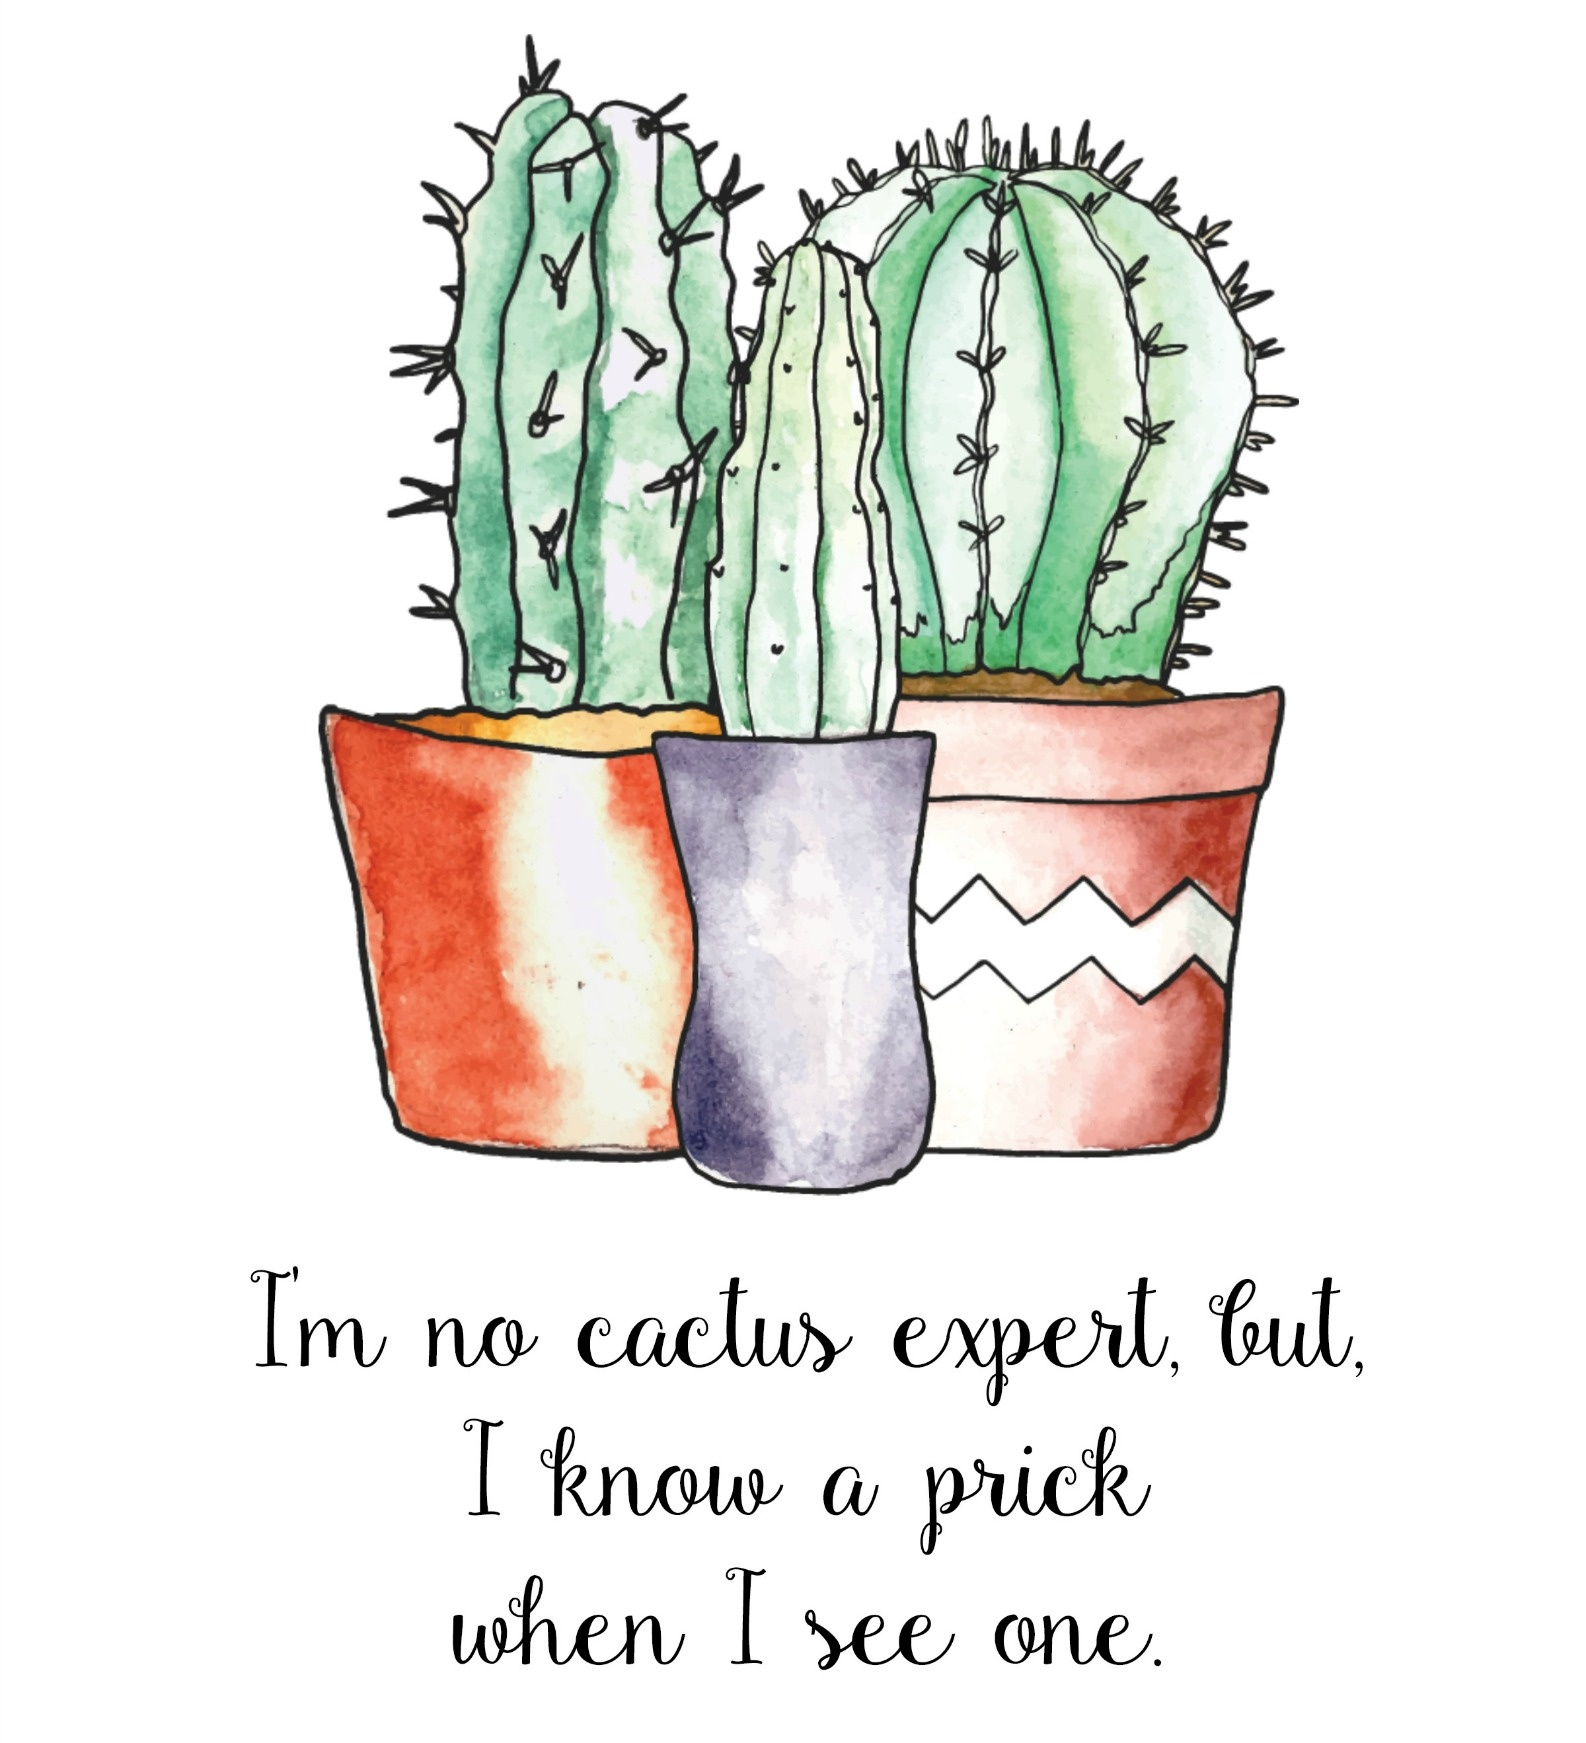 More Printables! Download Your Free Fun Cactus Printables Today! - Free Printable Cactus